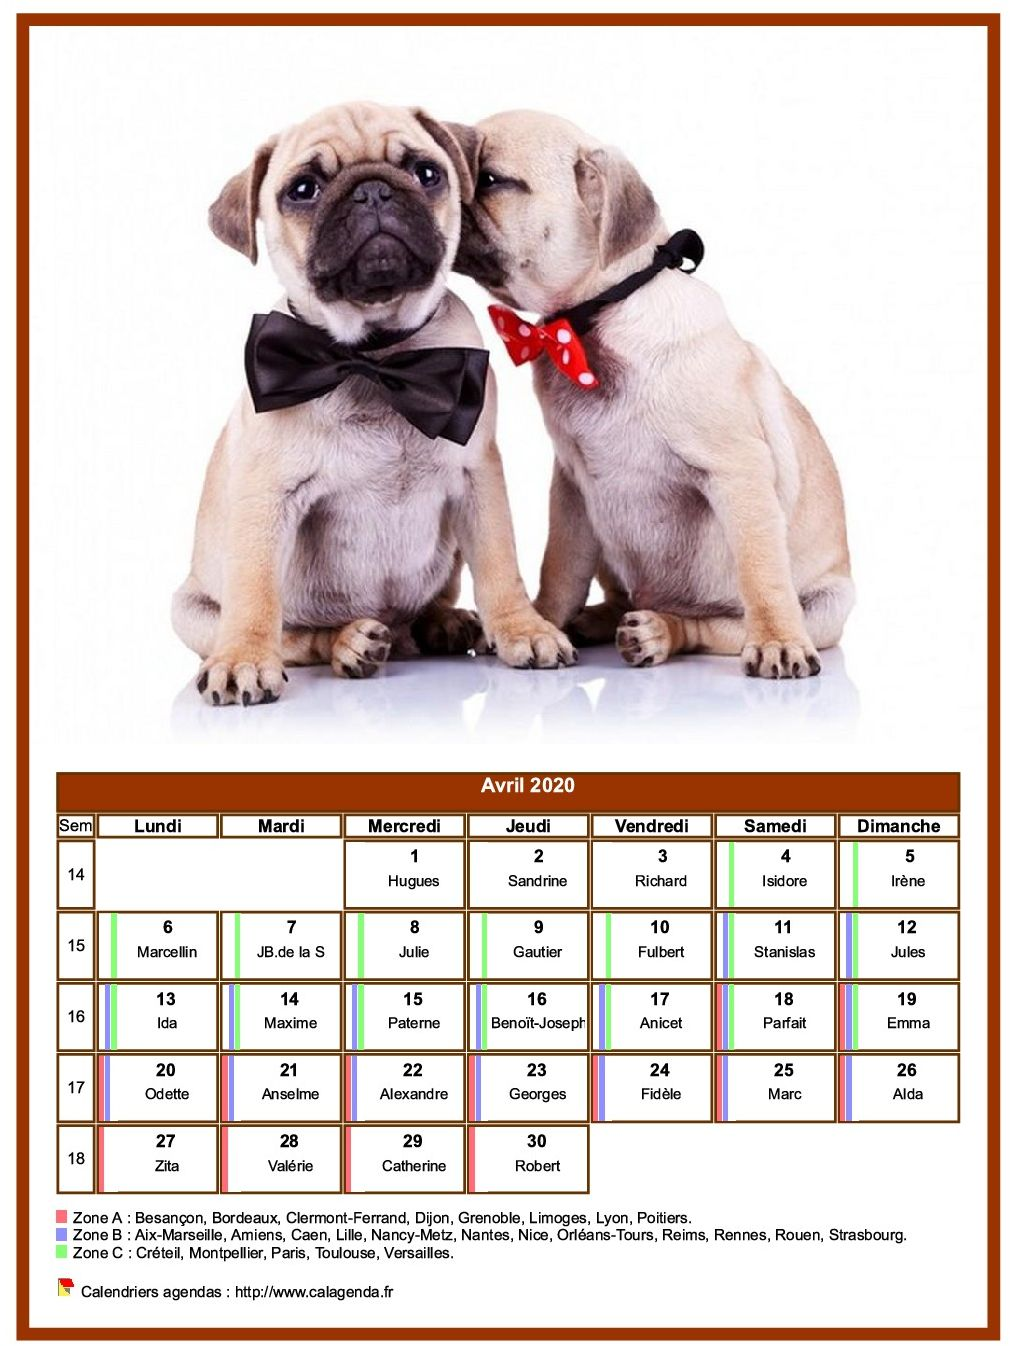 Calendrier avril 2020 chiens